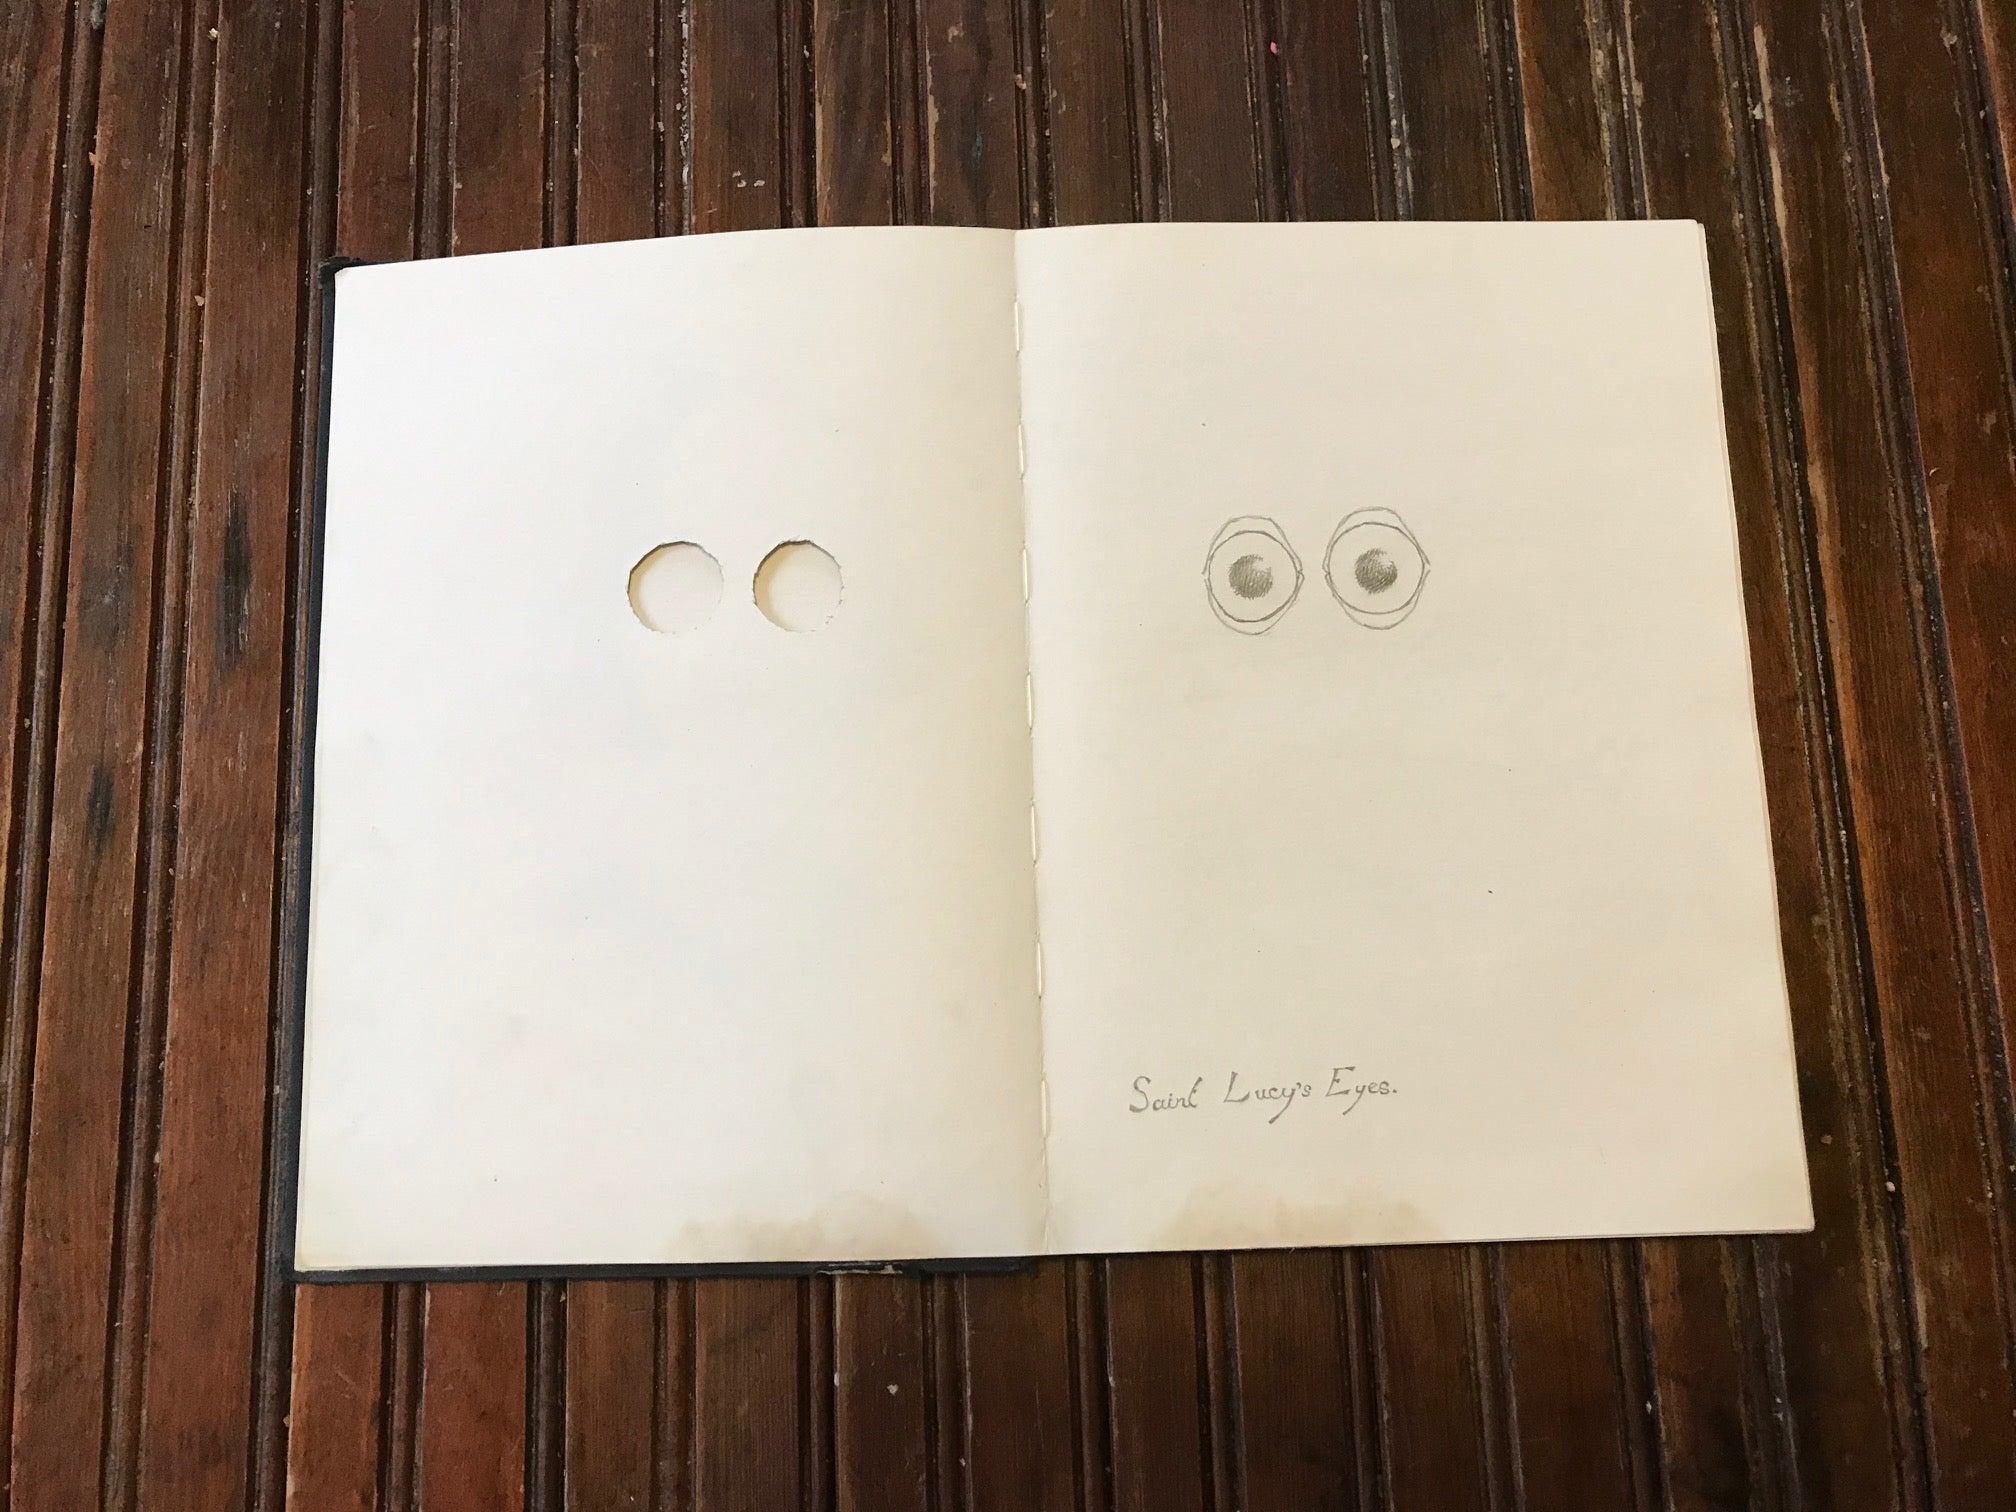 Saint Lucy's eyes drawing by Edward Carey